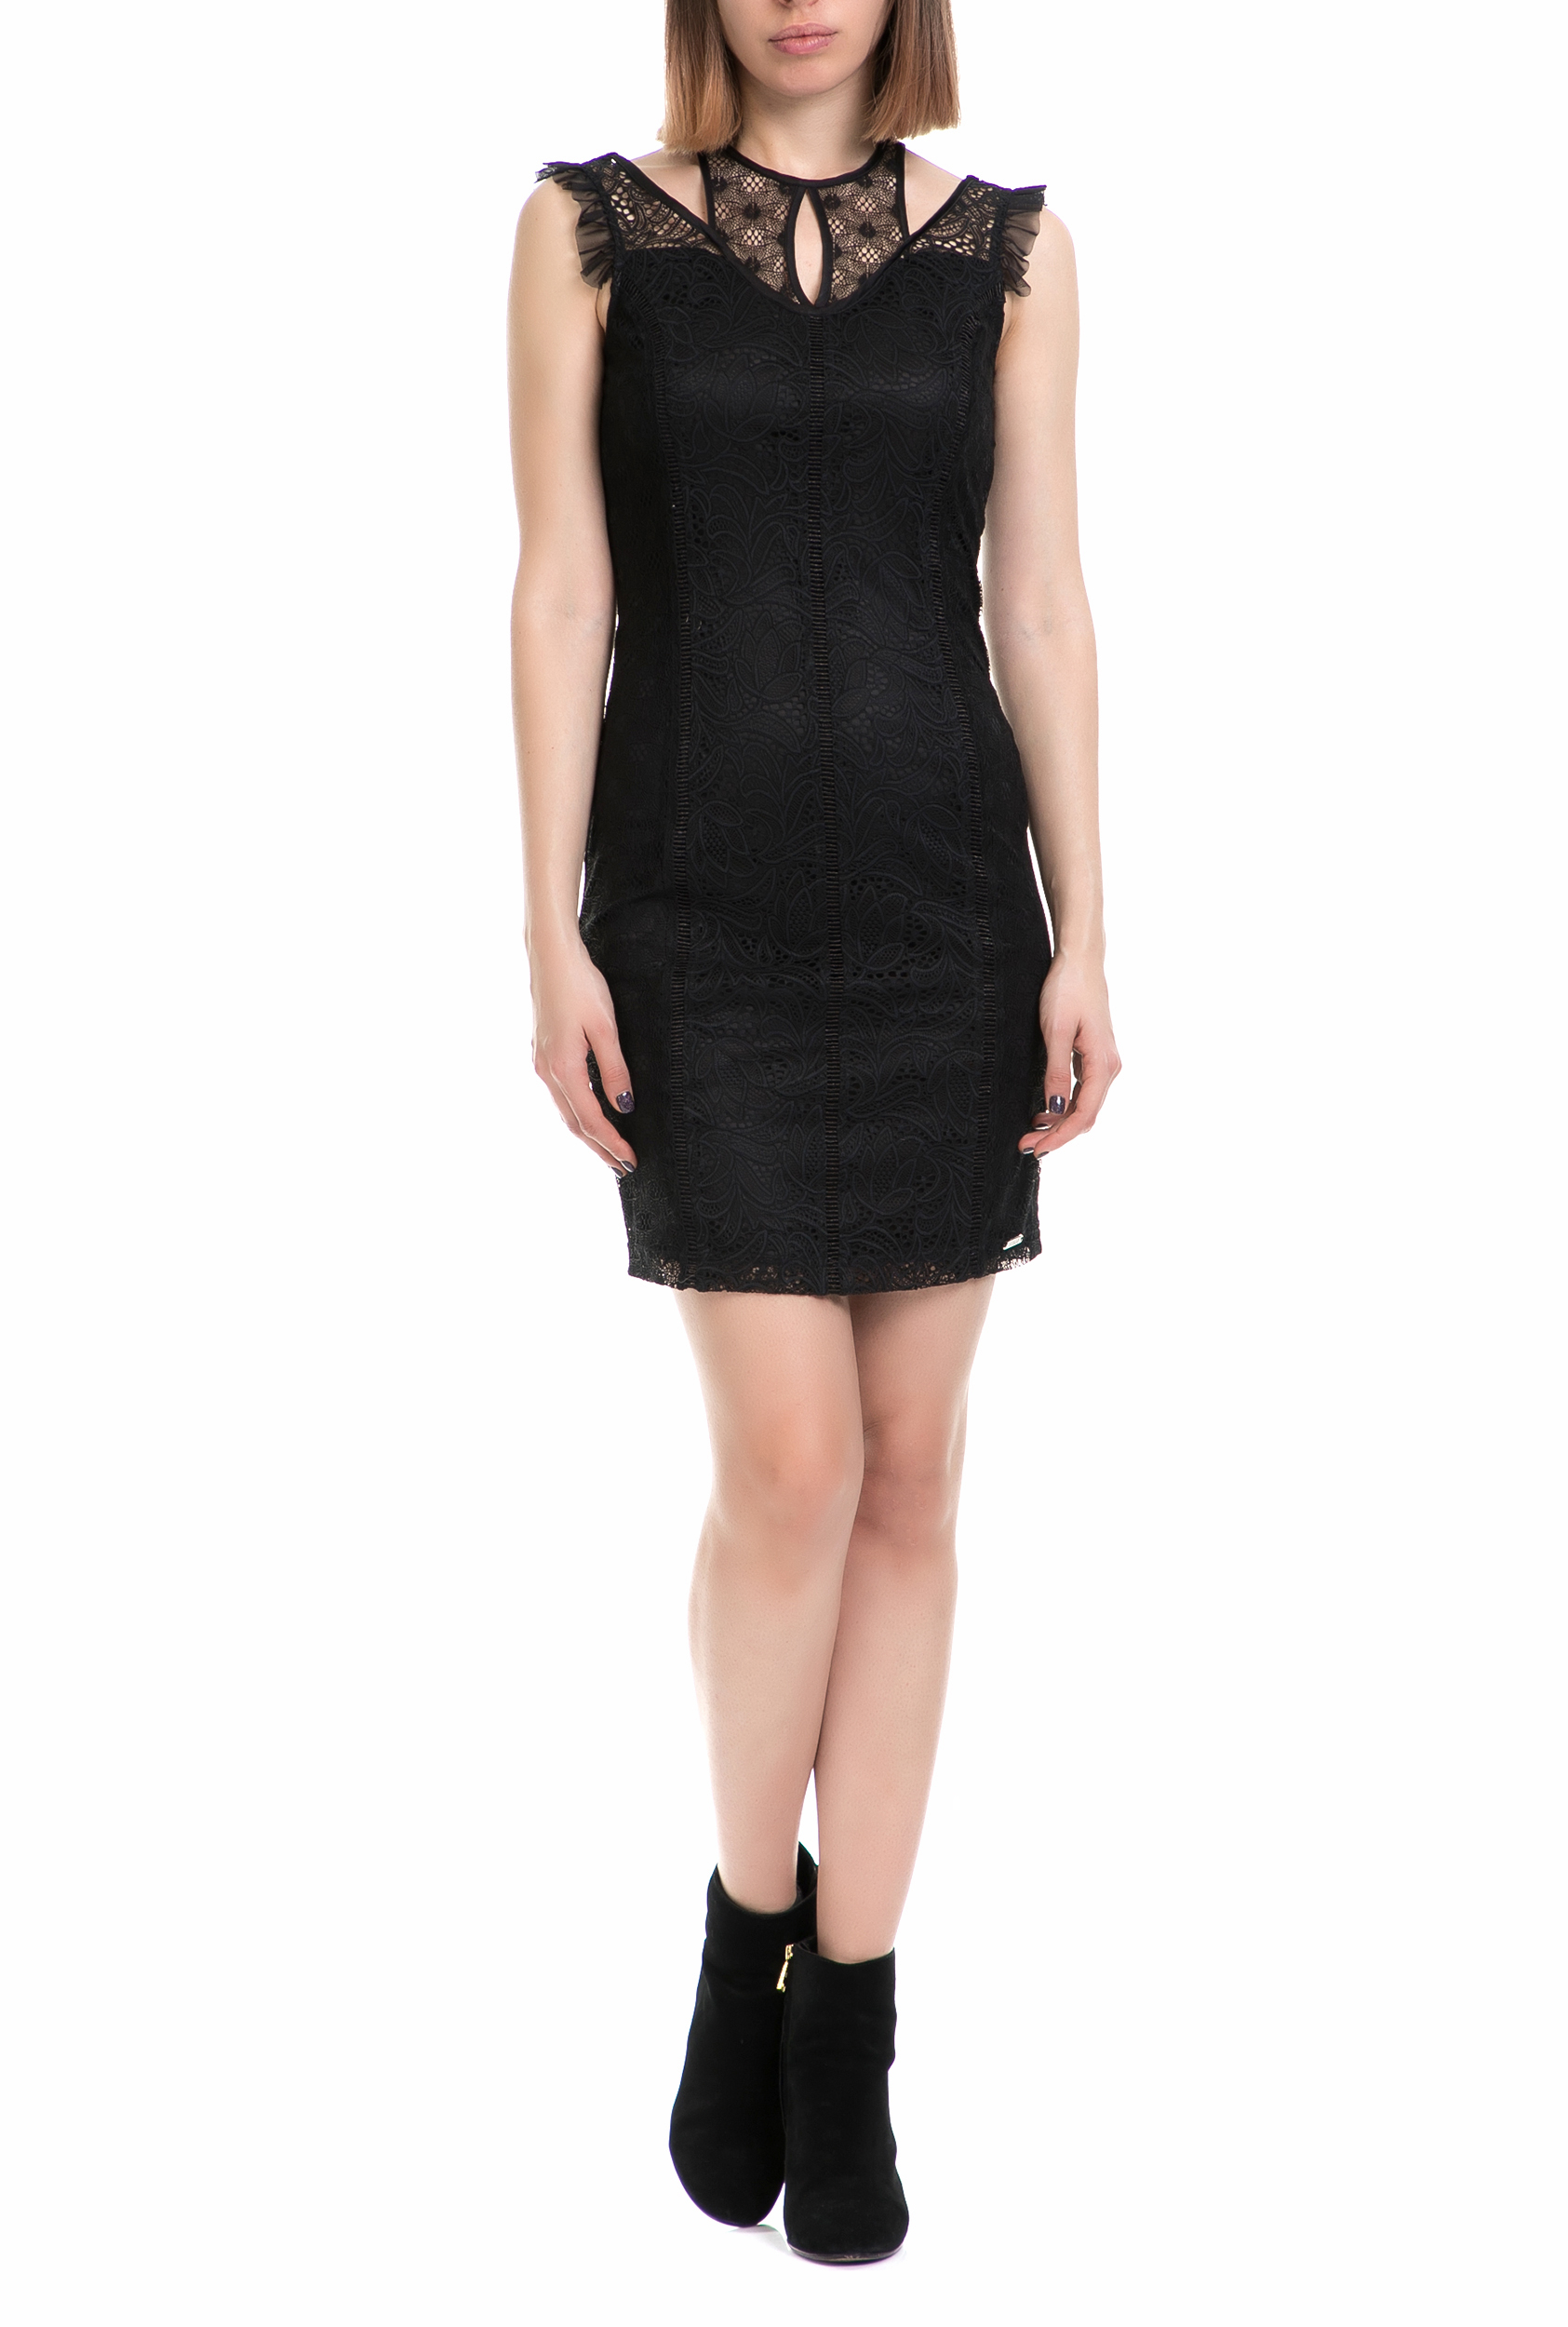 GUESS - Γυναικείο μίνι αμάνικο φόρεμα Guess μαύρο από δαντέλα 317220d8754